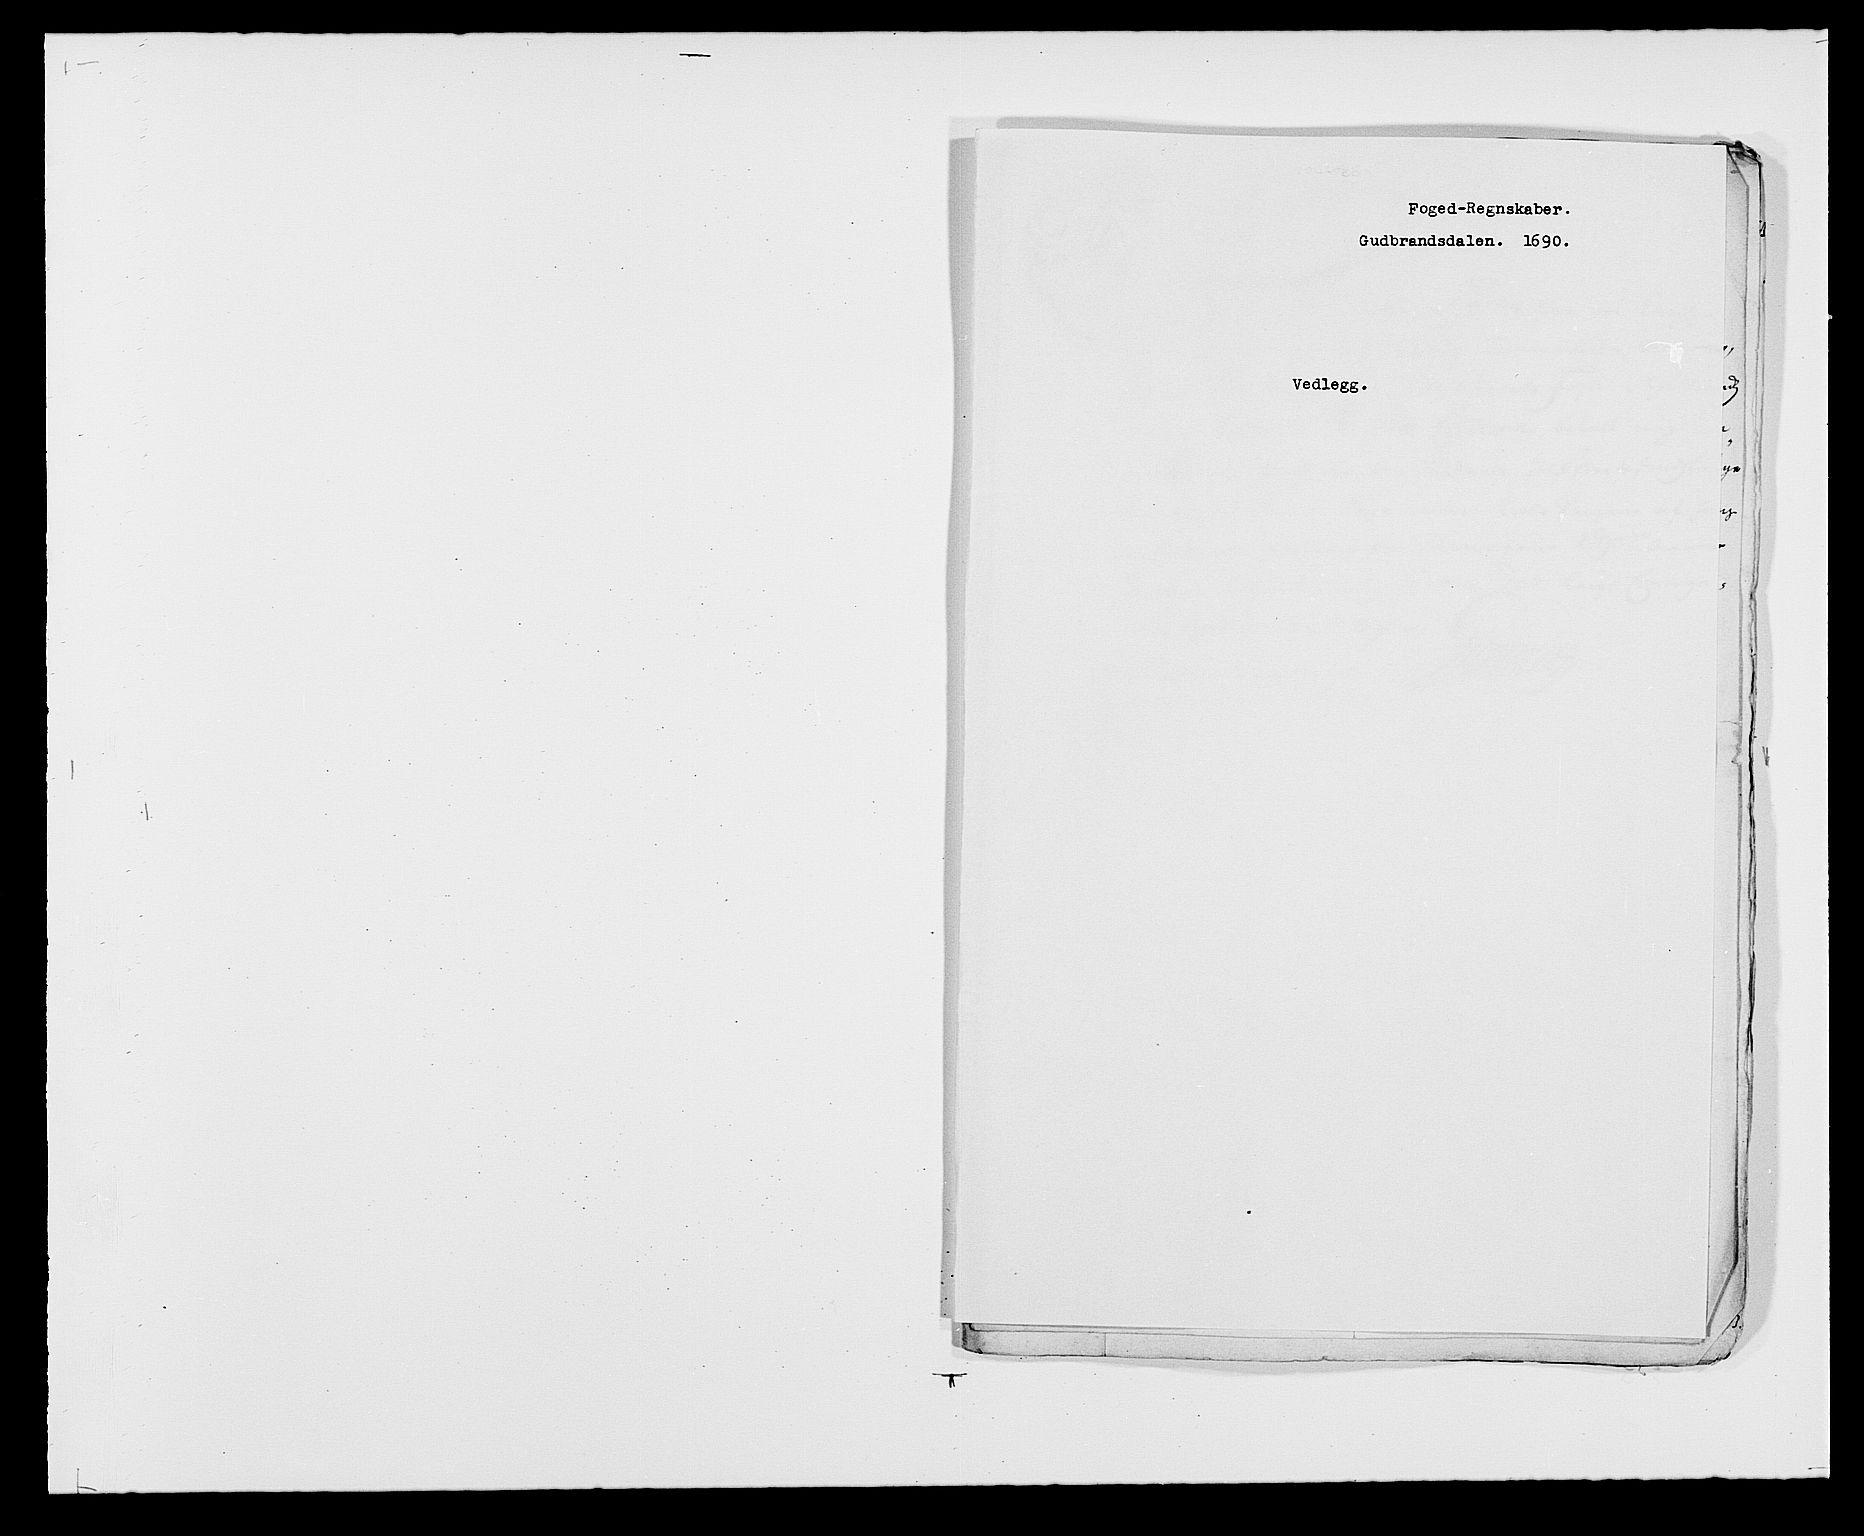 RA, Rentekammeret inntil 1814, Reviderte regnskaper, Fogderegnskap, R17/L1165: Fogderegnskap Gudbrandsdal, 1690-1692, s. 175